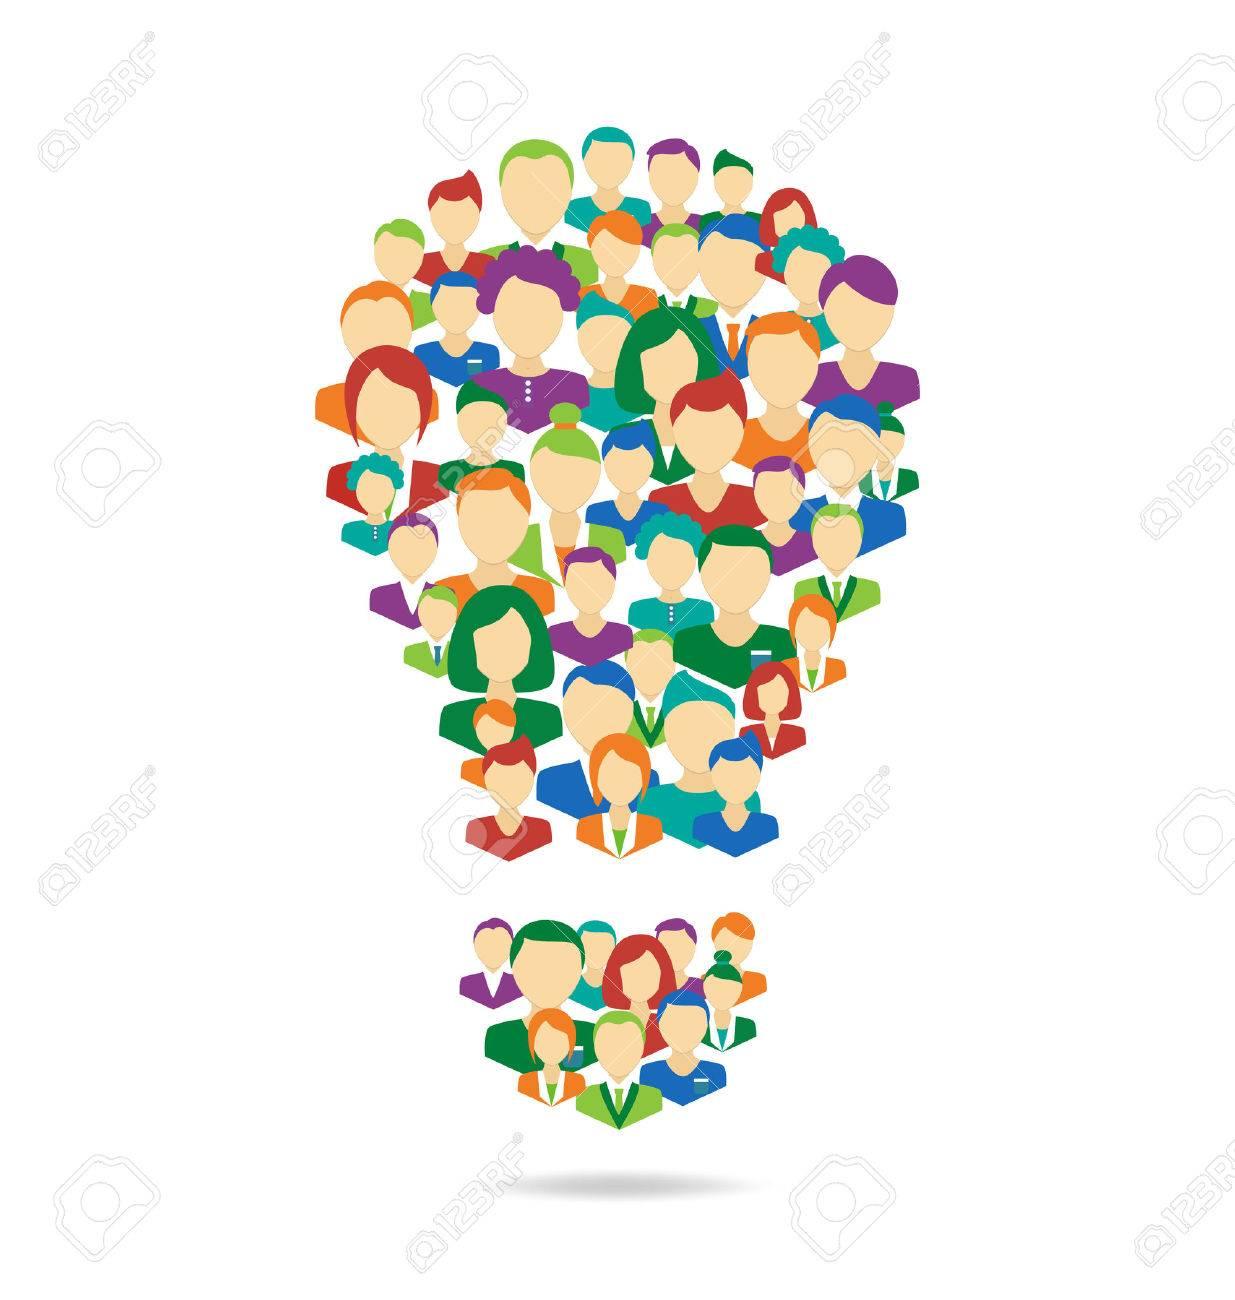 Flat Idea lamp symbolize crowdsourcing process isolated on white background - 33955472